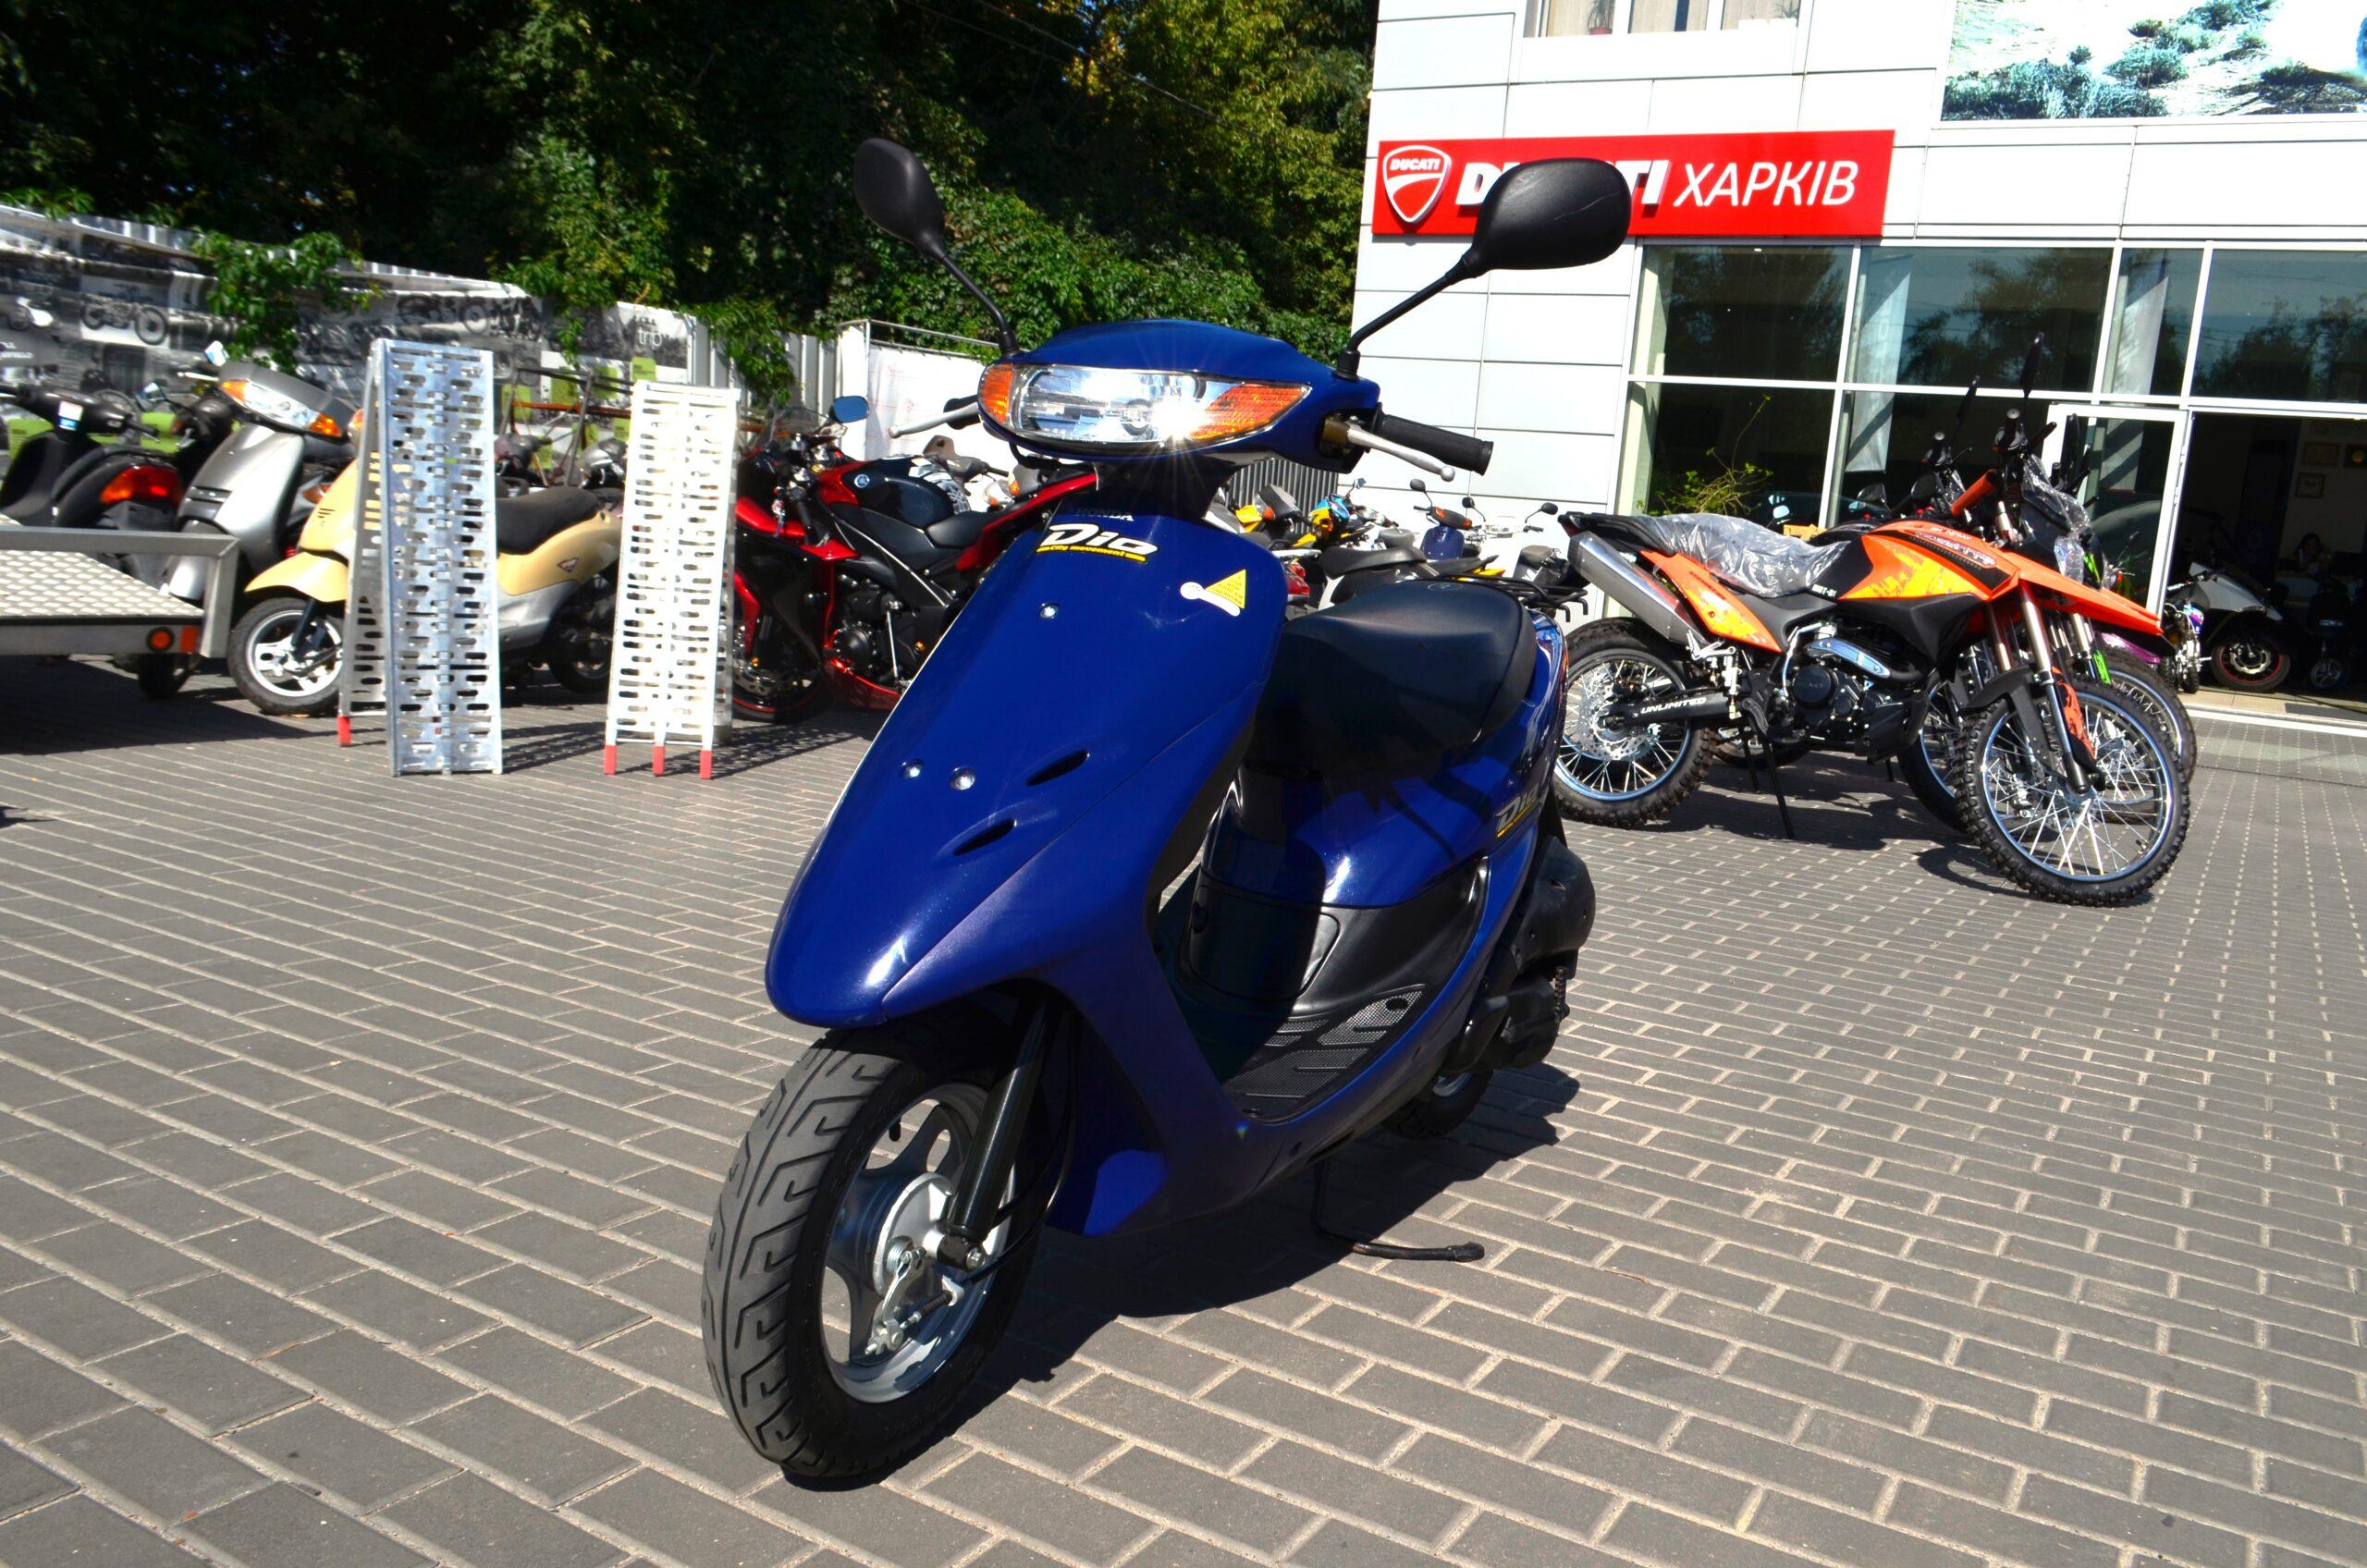 МОПЕД HONDA DIO AF34 СИНИЙ  Артмото - купить квадроцикл в украине и харькове, мотоцикл, снегоход, скутер, мопед, электромобиль